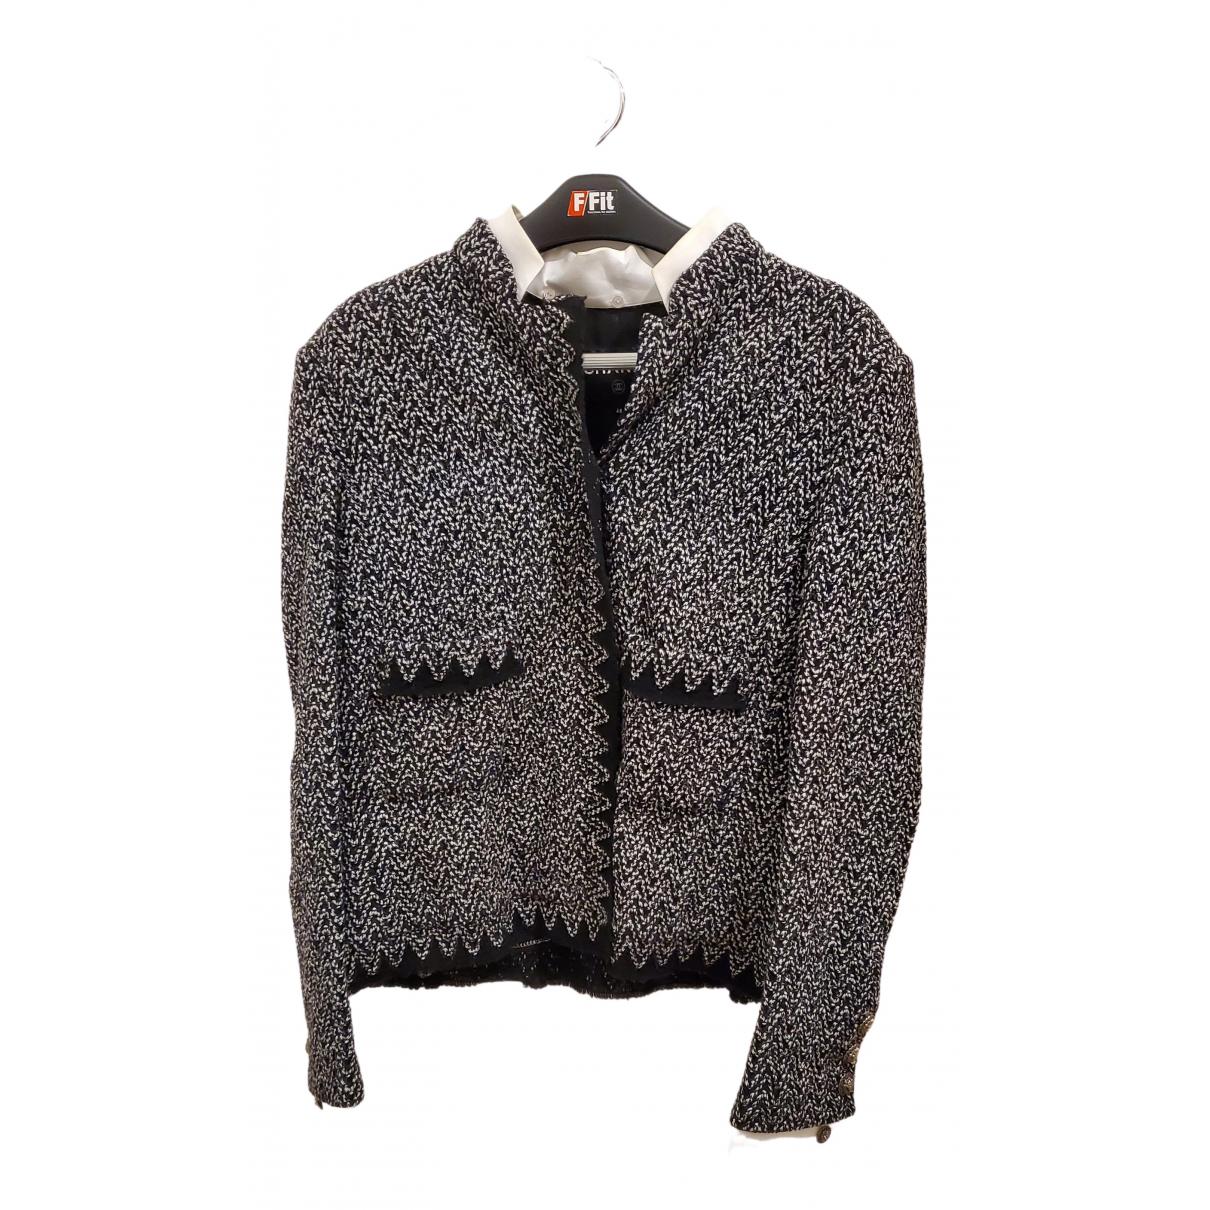 Chanel \N Jacke in  Schwarz Tweed